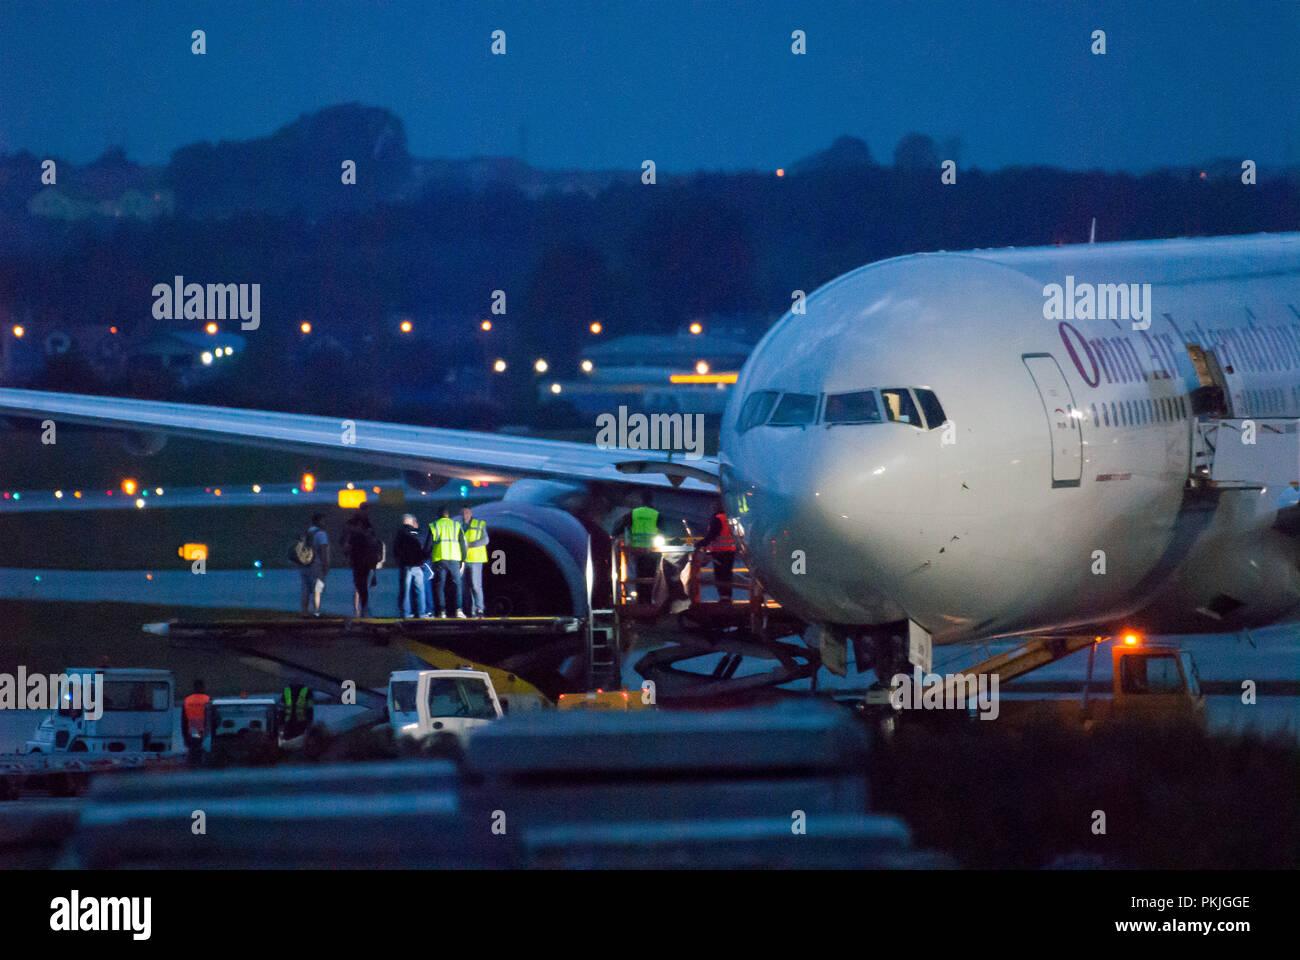 Charter Omni Air International Boeing 777-2U8(ER) in Gdansk Lech Walesa Airport in Gdansk, Poland. September 12th 2018 © Wojciech Strozyk / Alamy Stoc - Stock Image